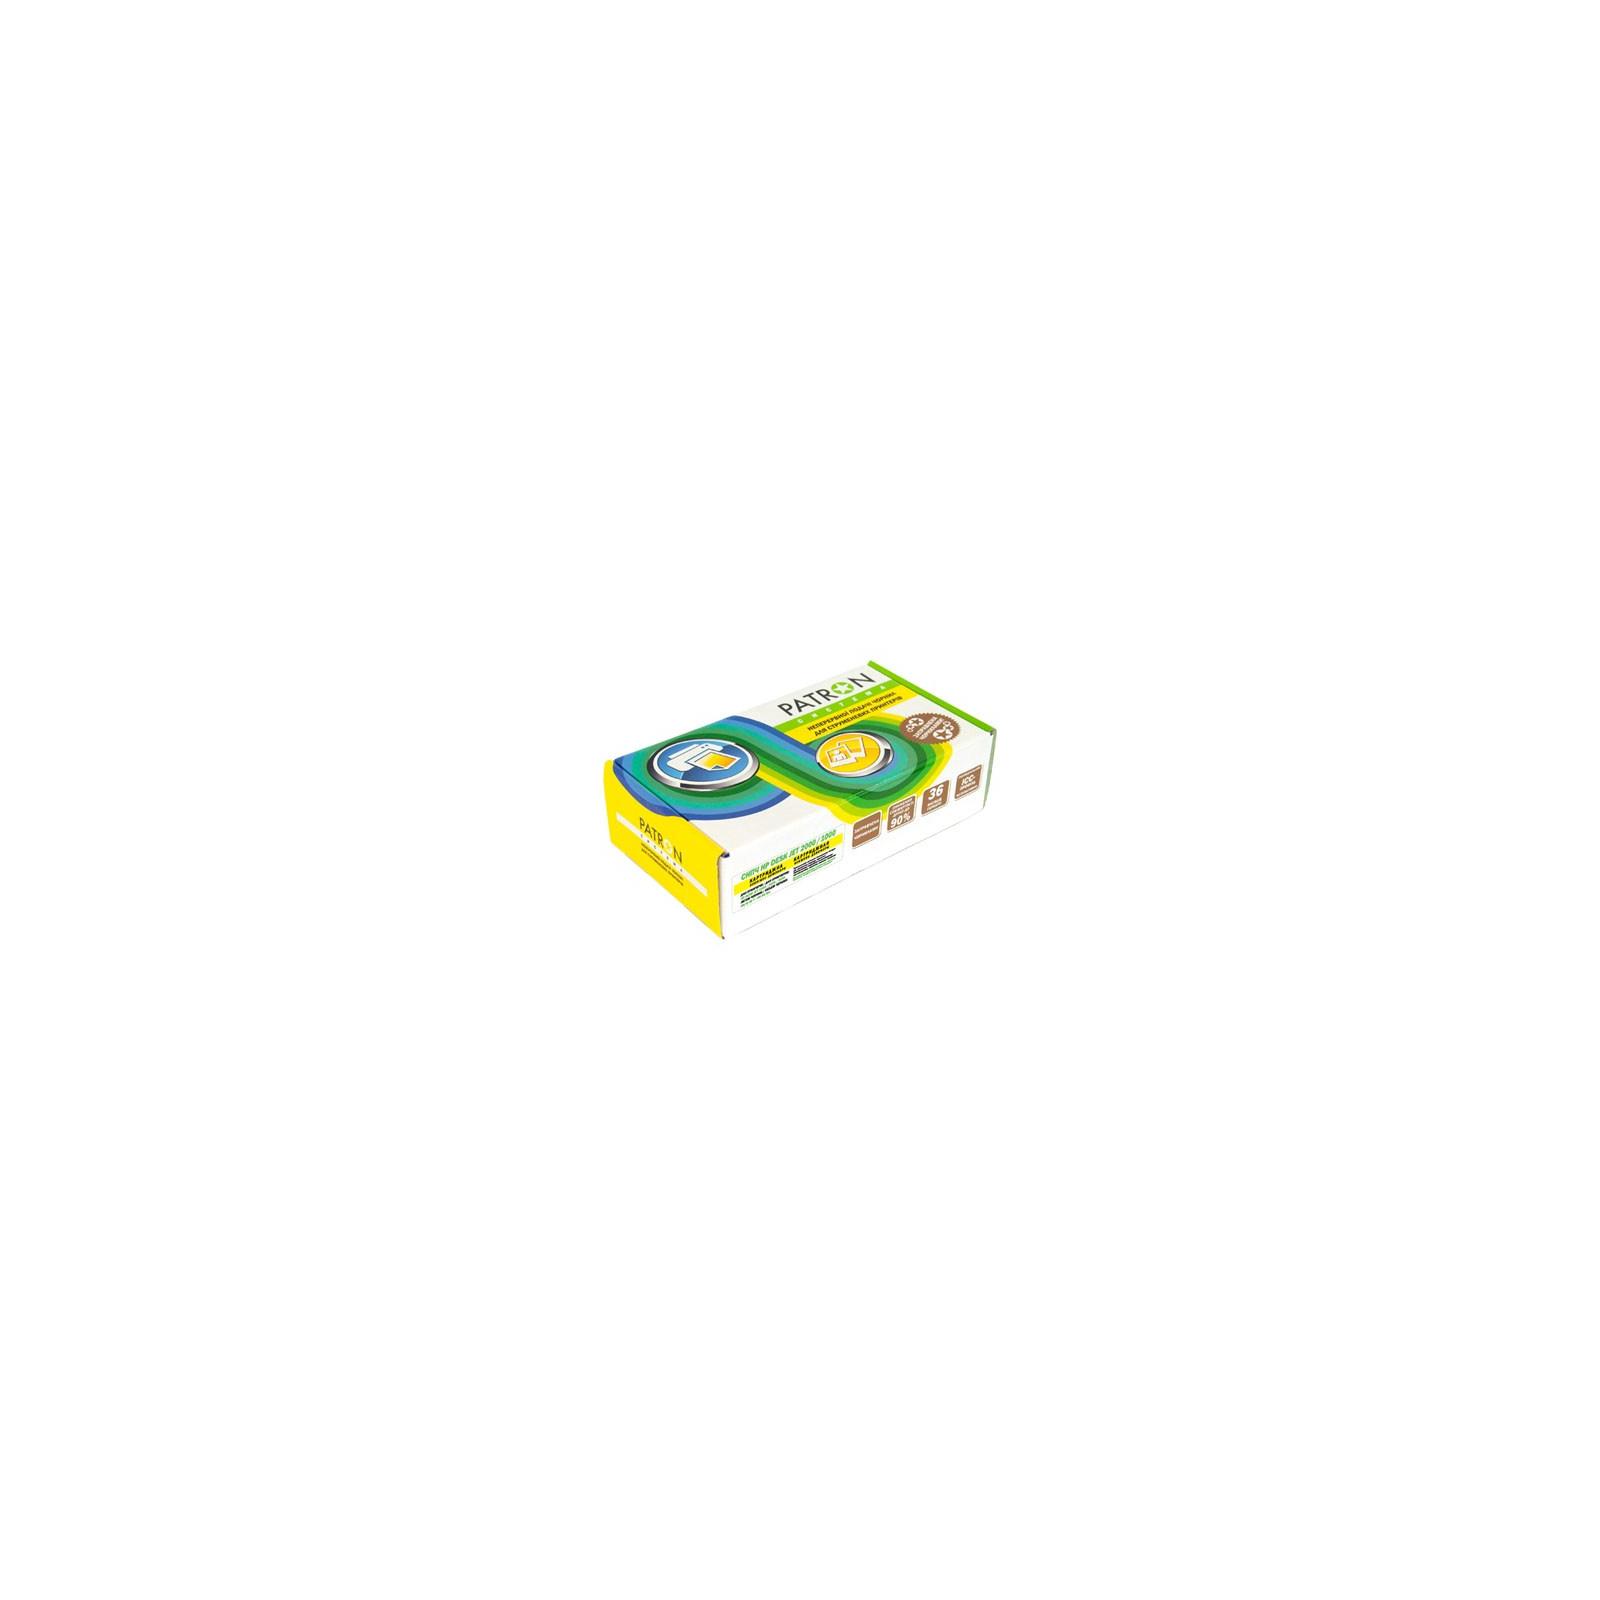 СНПЧ PATRON HP DJ 1000/2000/3000 (dashpot) (CISS-PN-C-HP-2000)